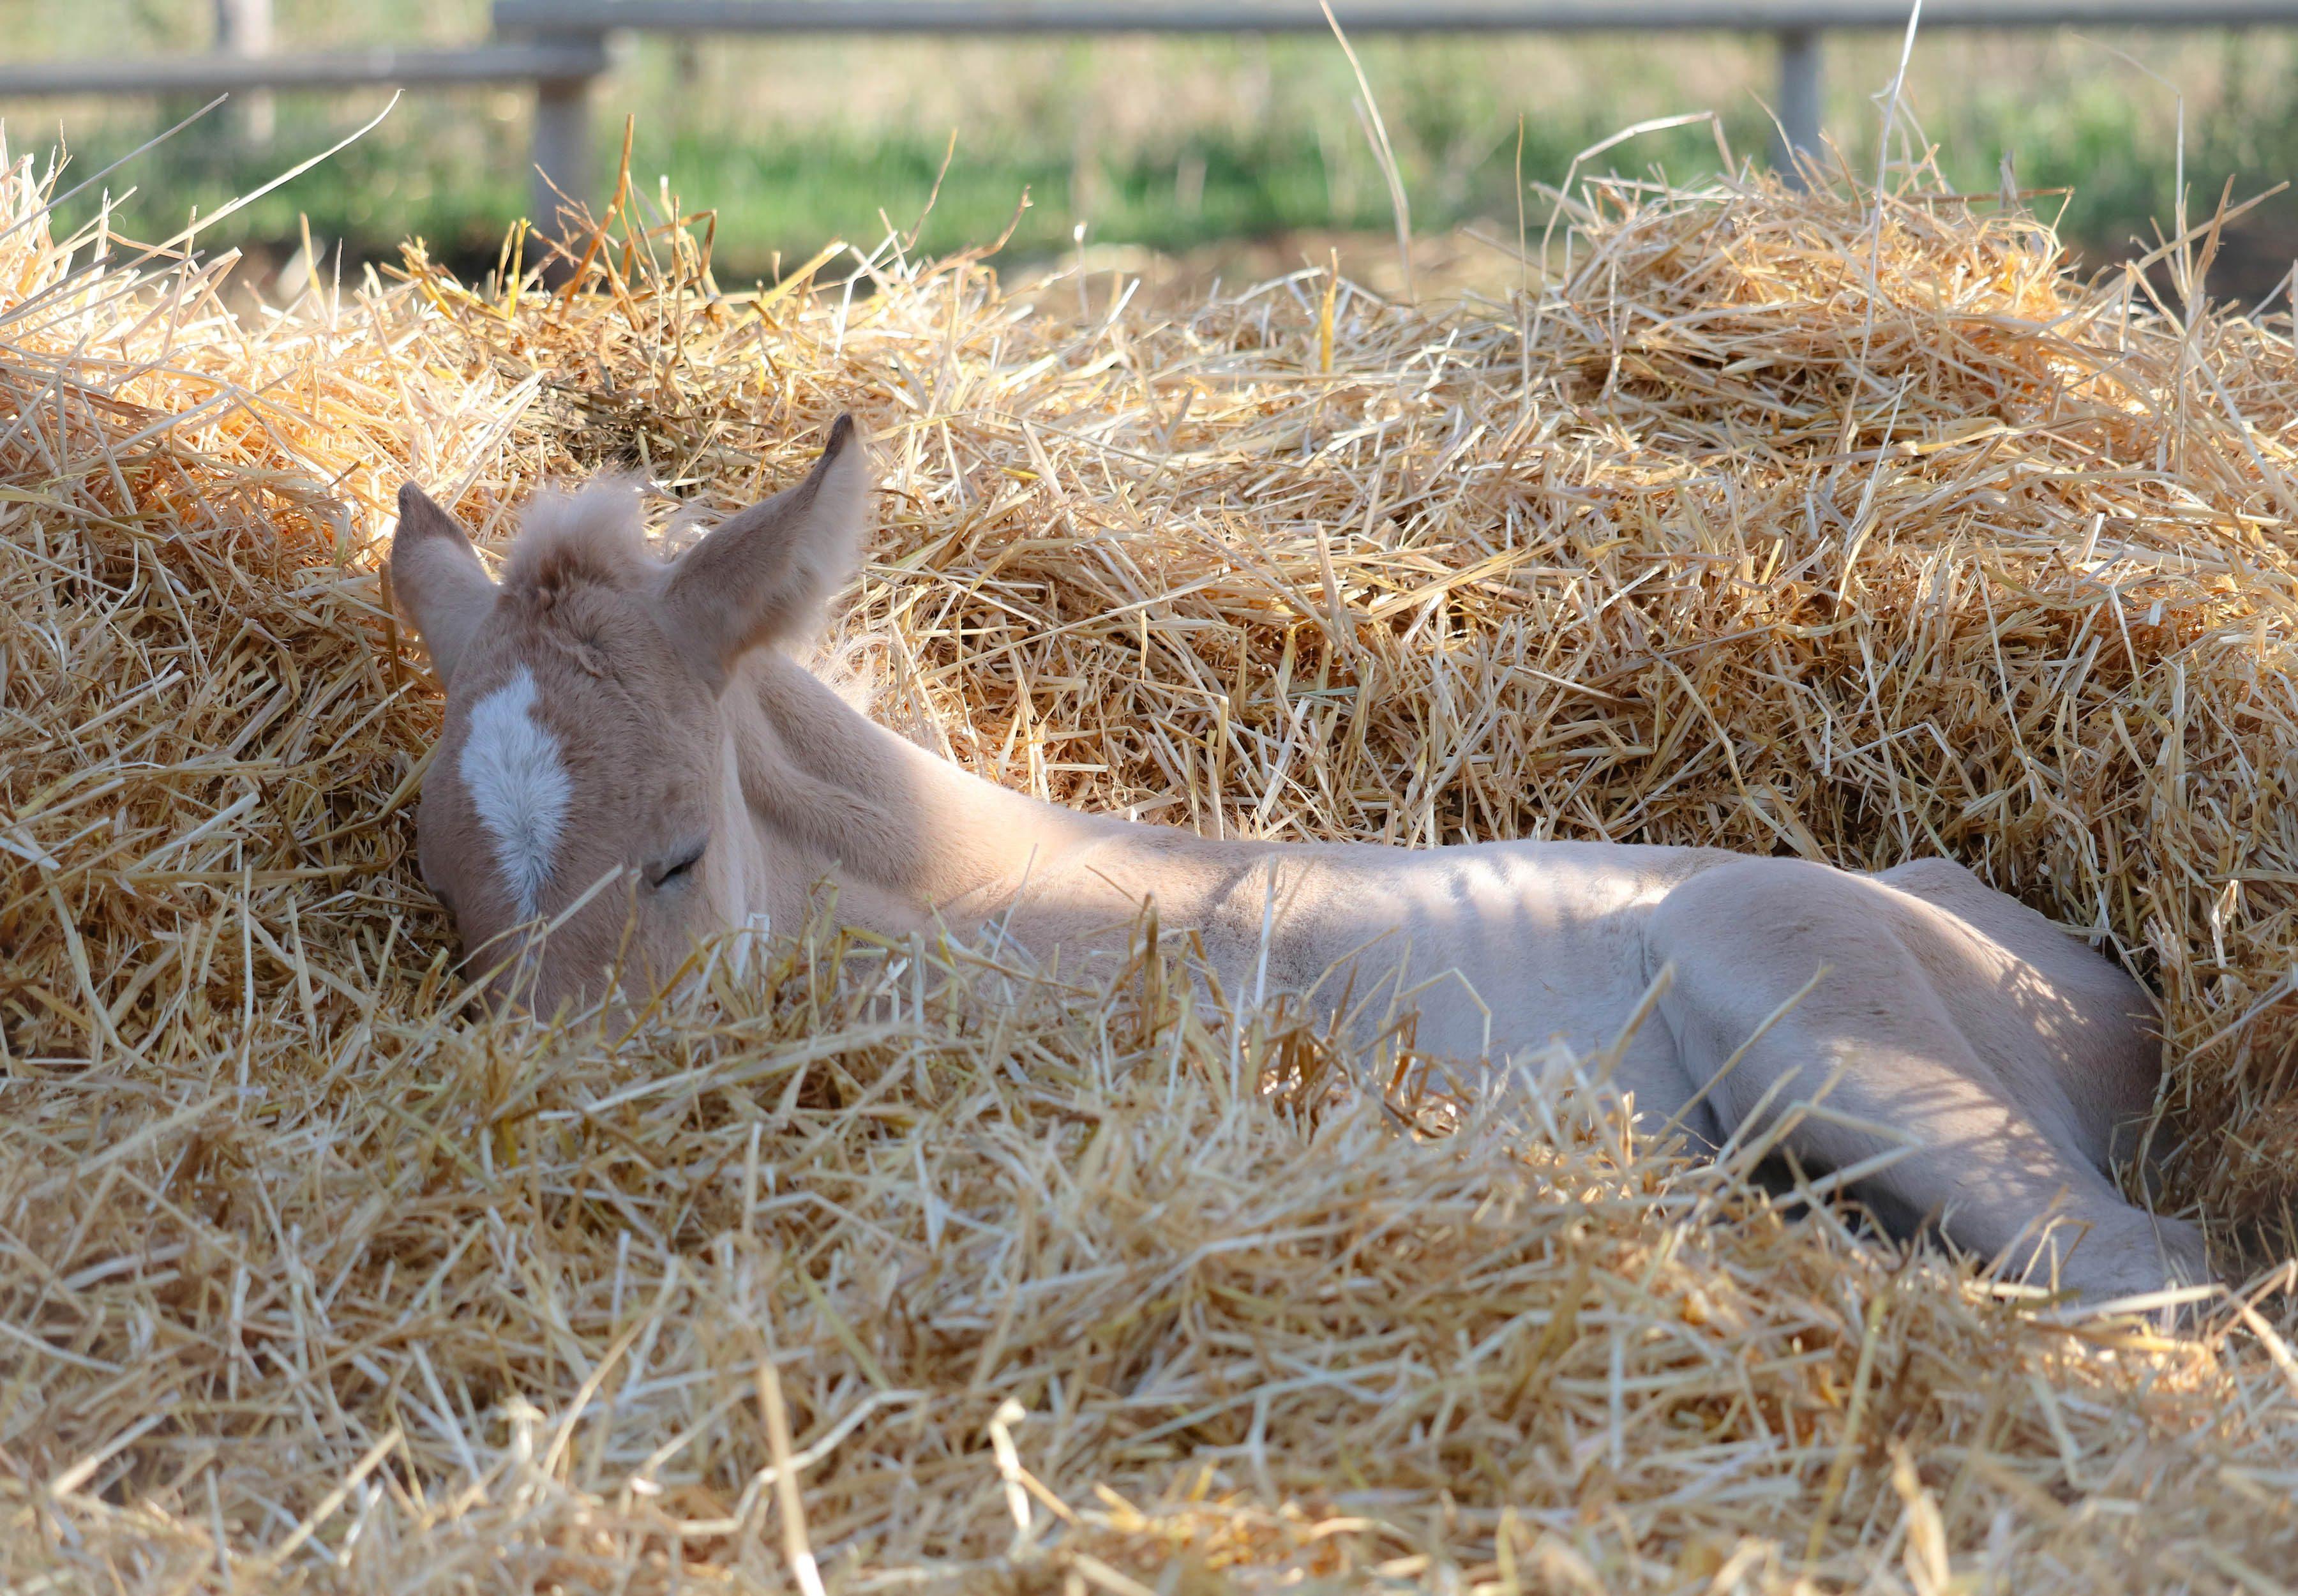 Pony sleeping in the hay